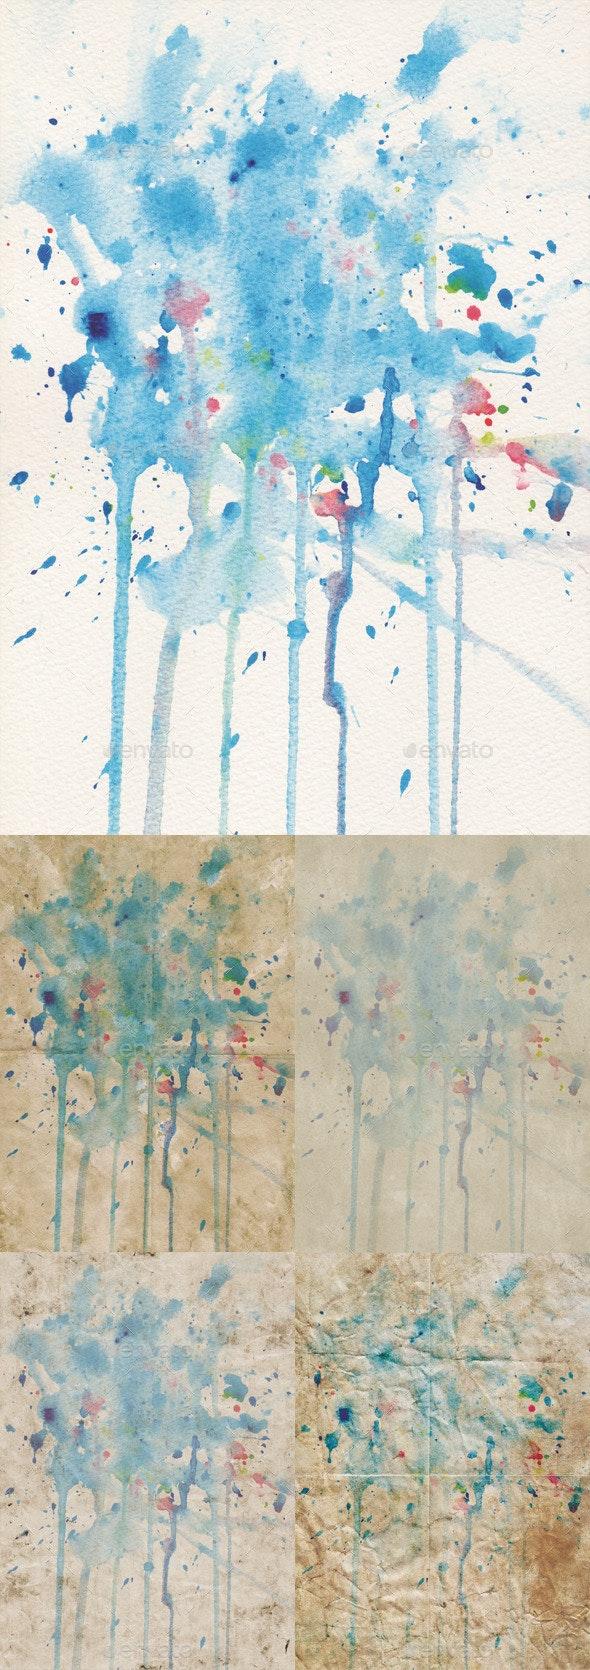 Blue watercolour textures - Art Textures